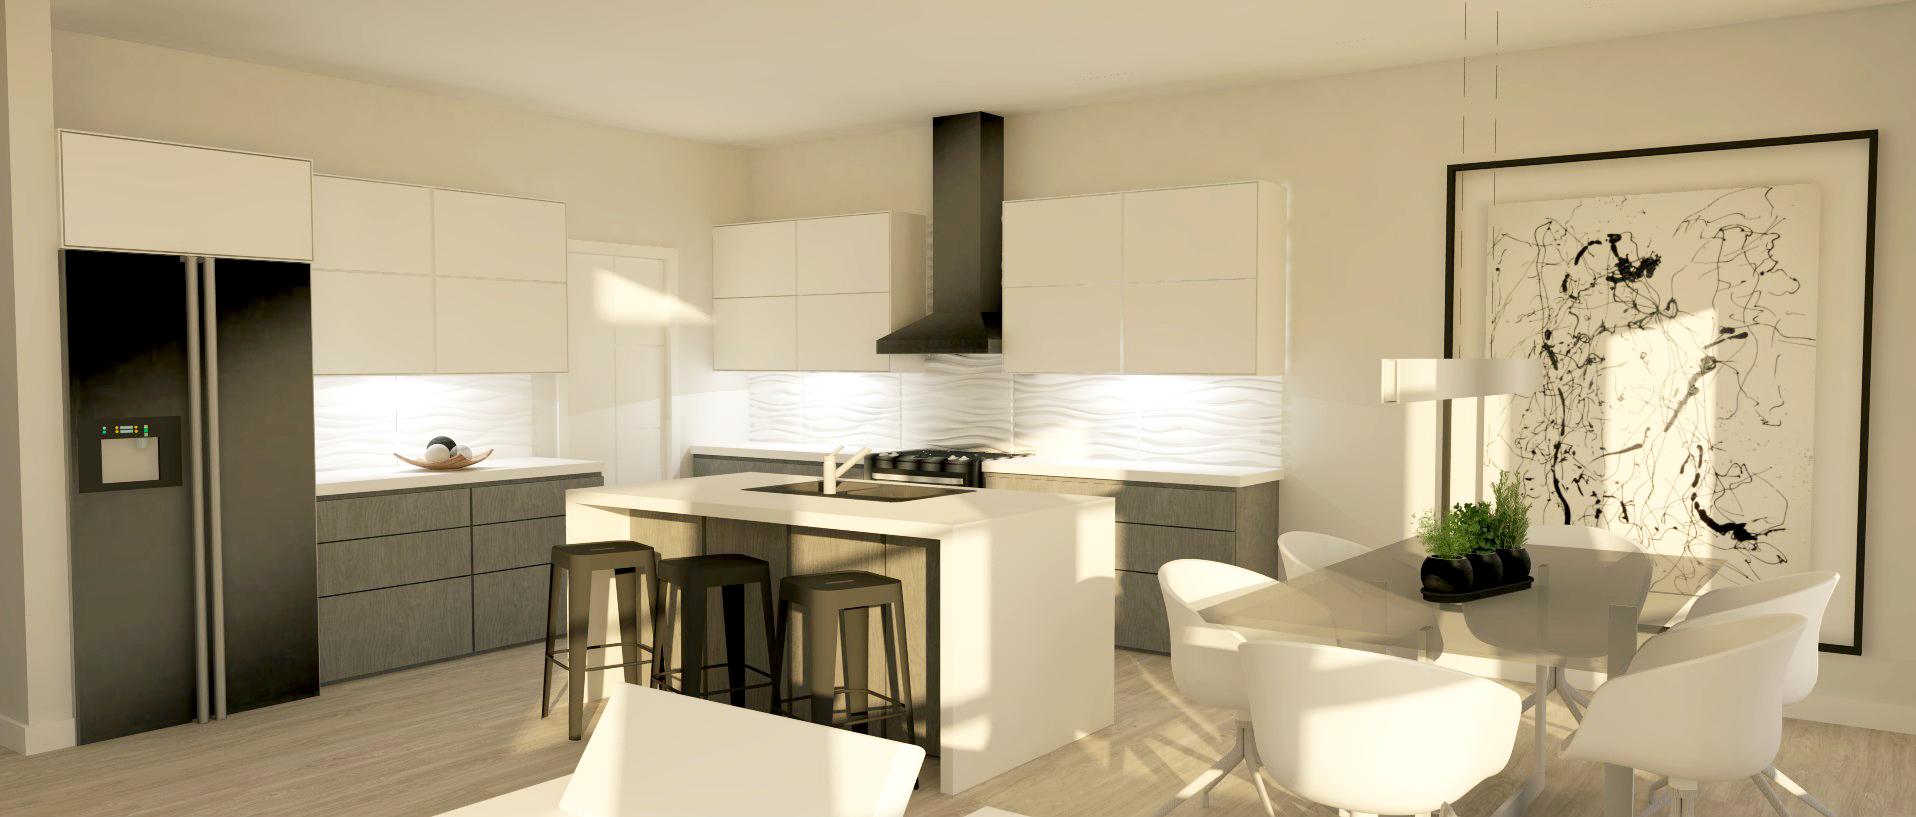 kitchen designers winnipeg. Kitchen Designers Winnipeg  Valuable Ideas Astounding Gallery Best inspiration